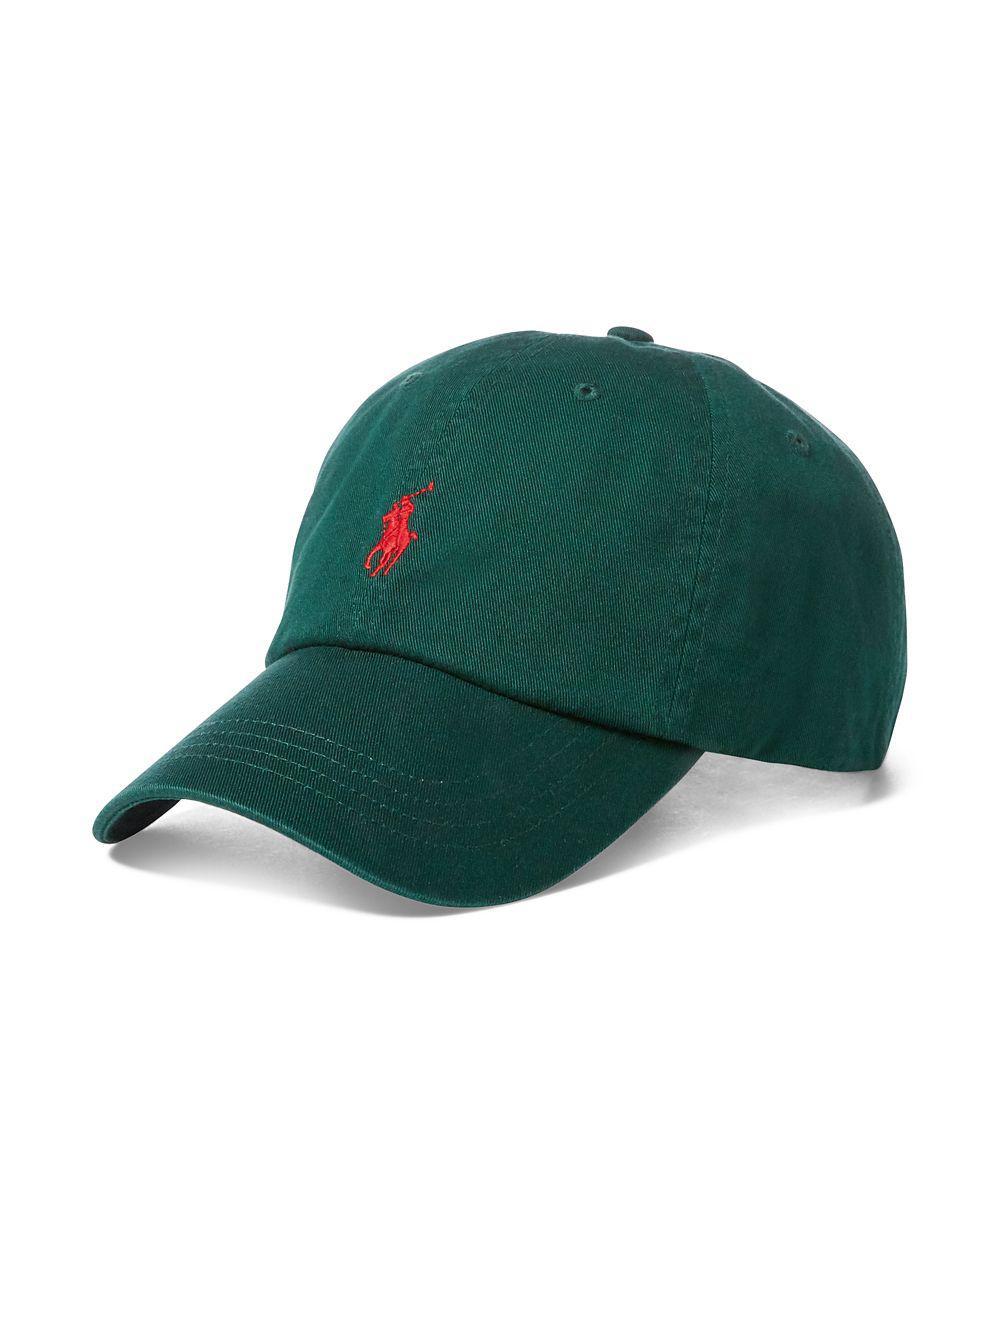 55111e77 Polo Ralph Lauren Cotton Chino Baseball Cap in Green for Men - Lyst